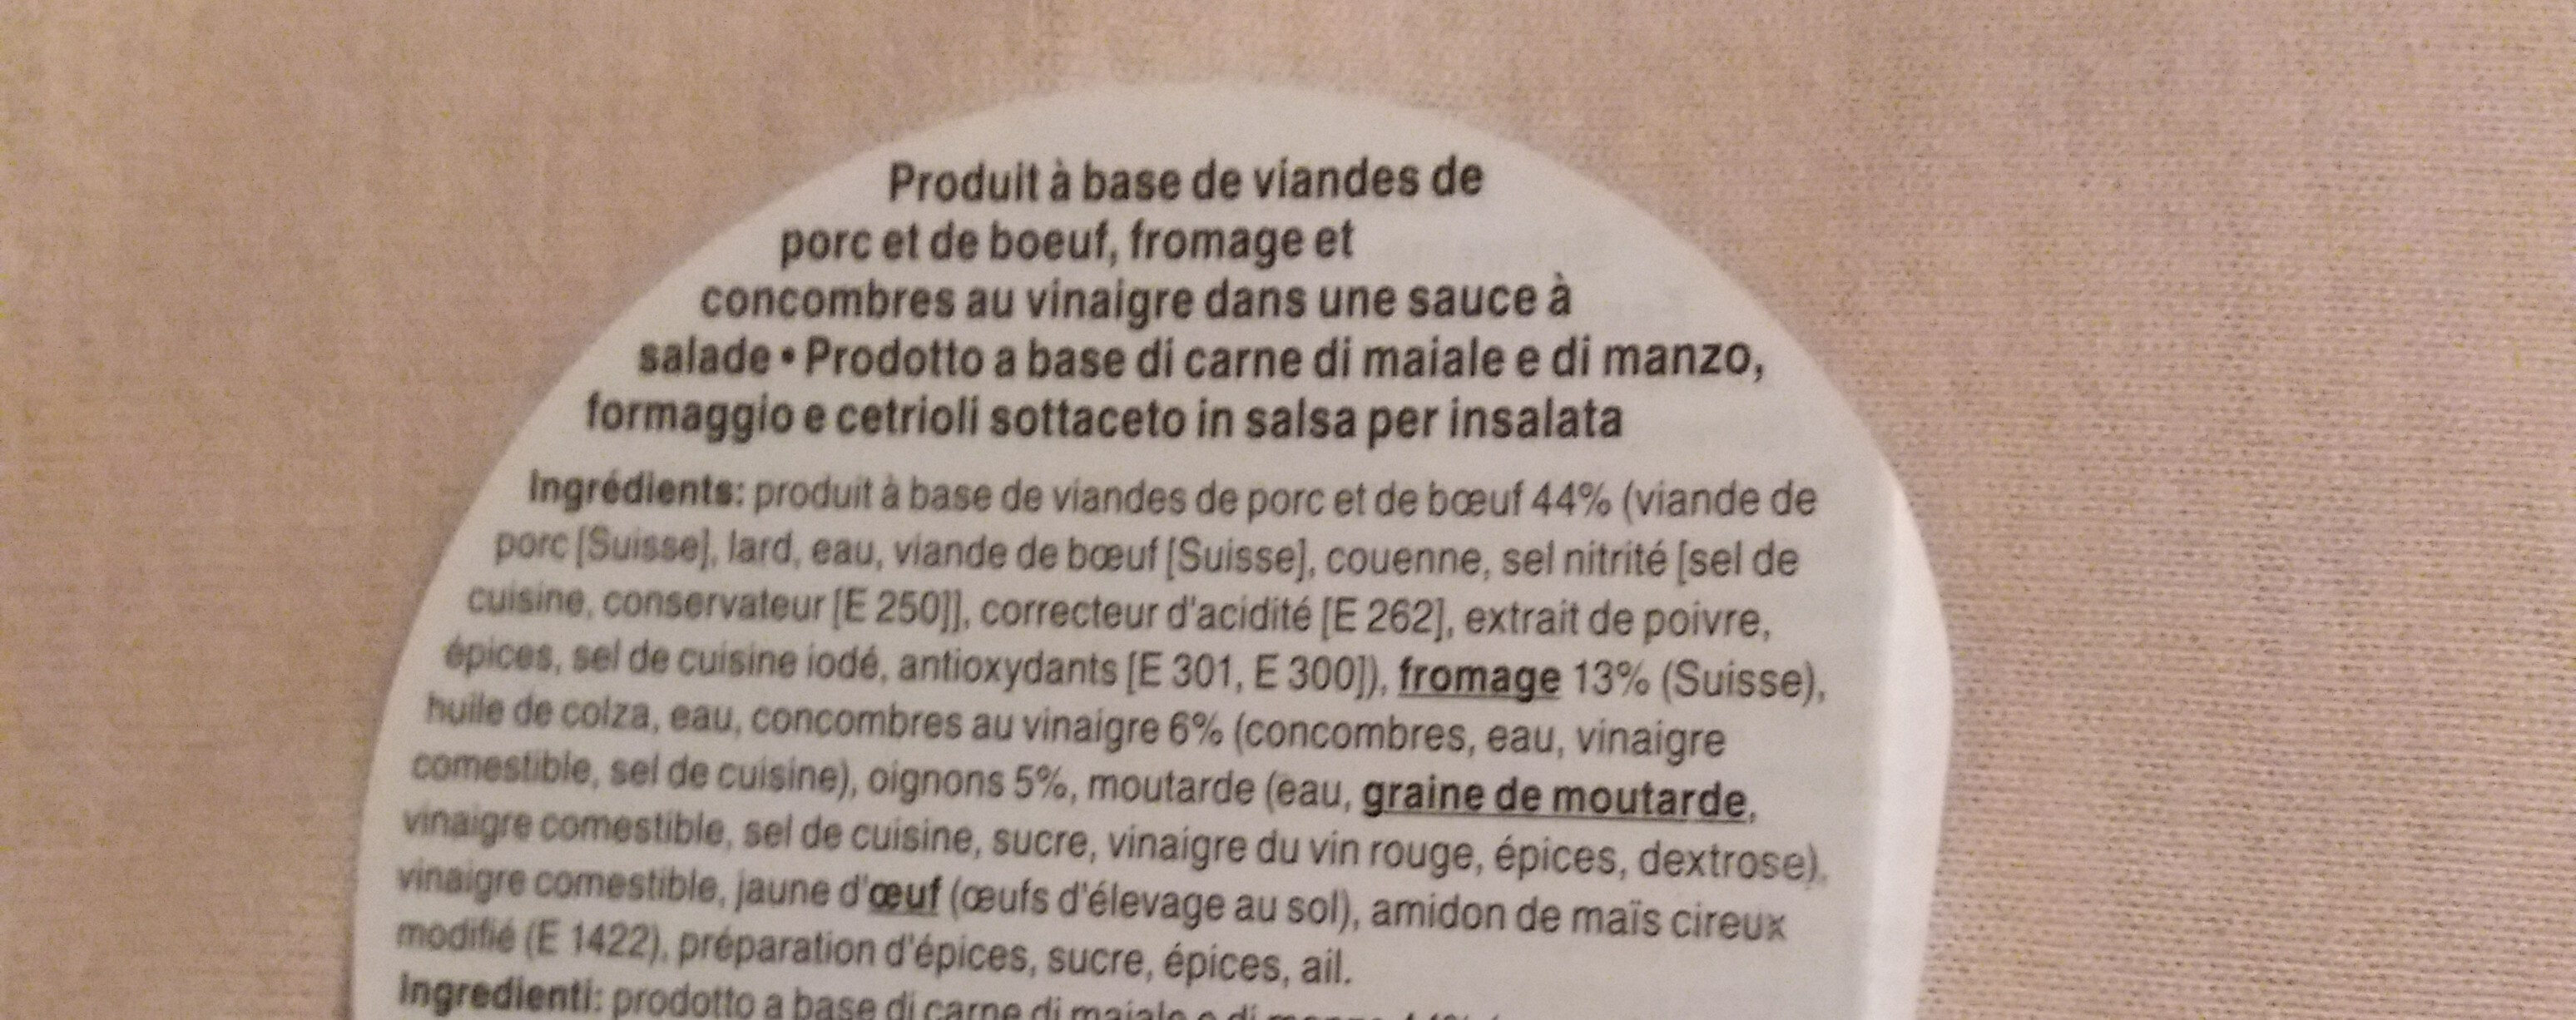 salade saucisse fromage - Ingrédients